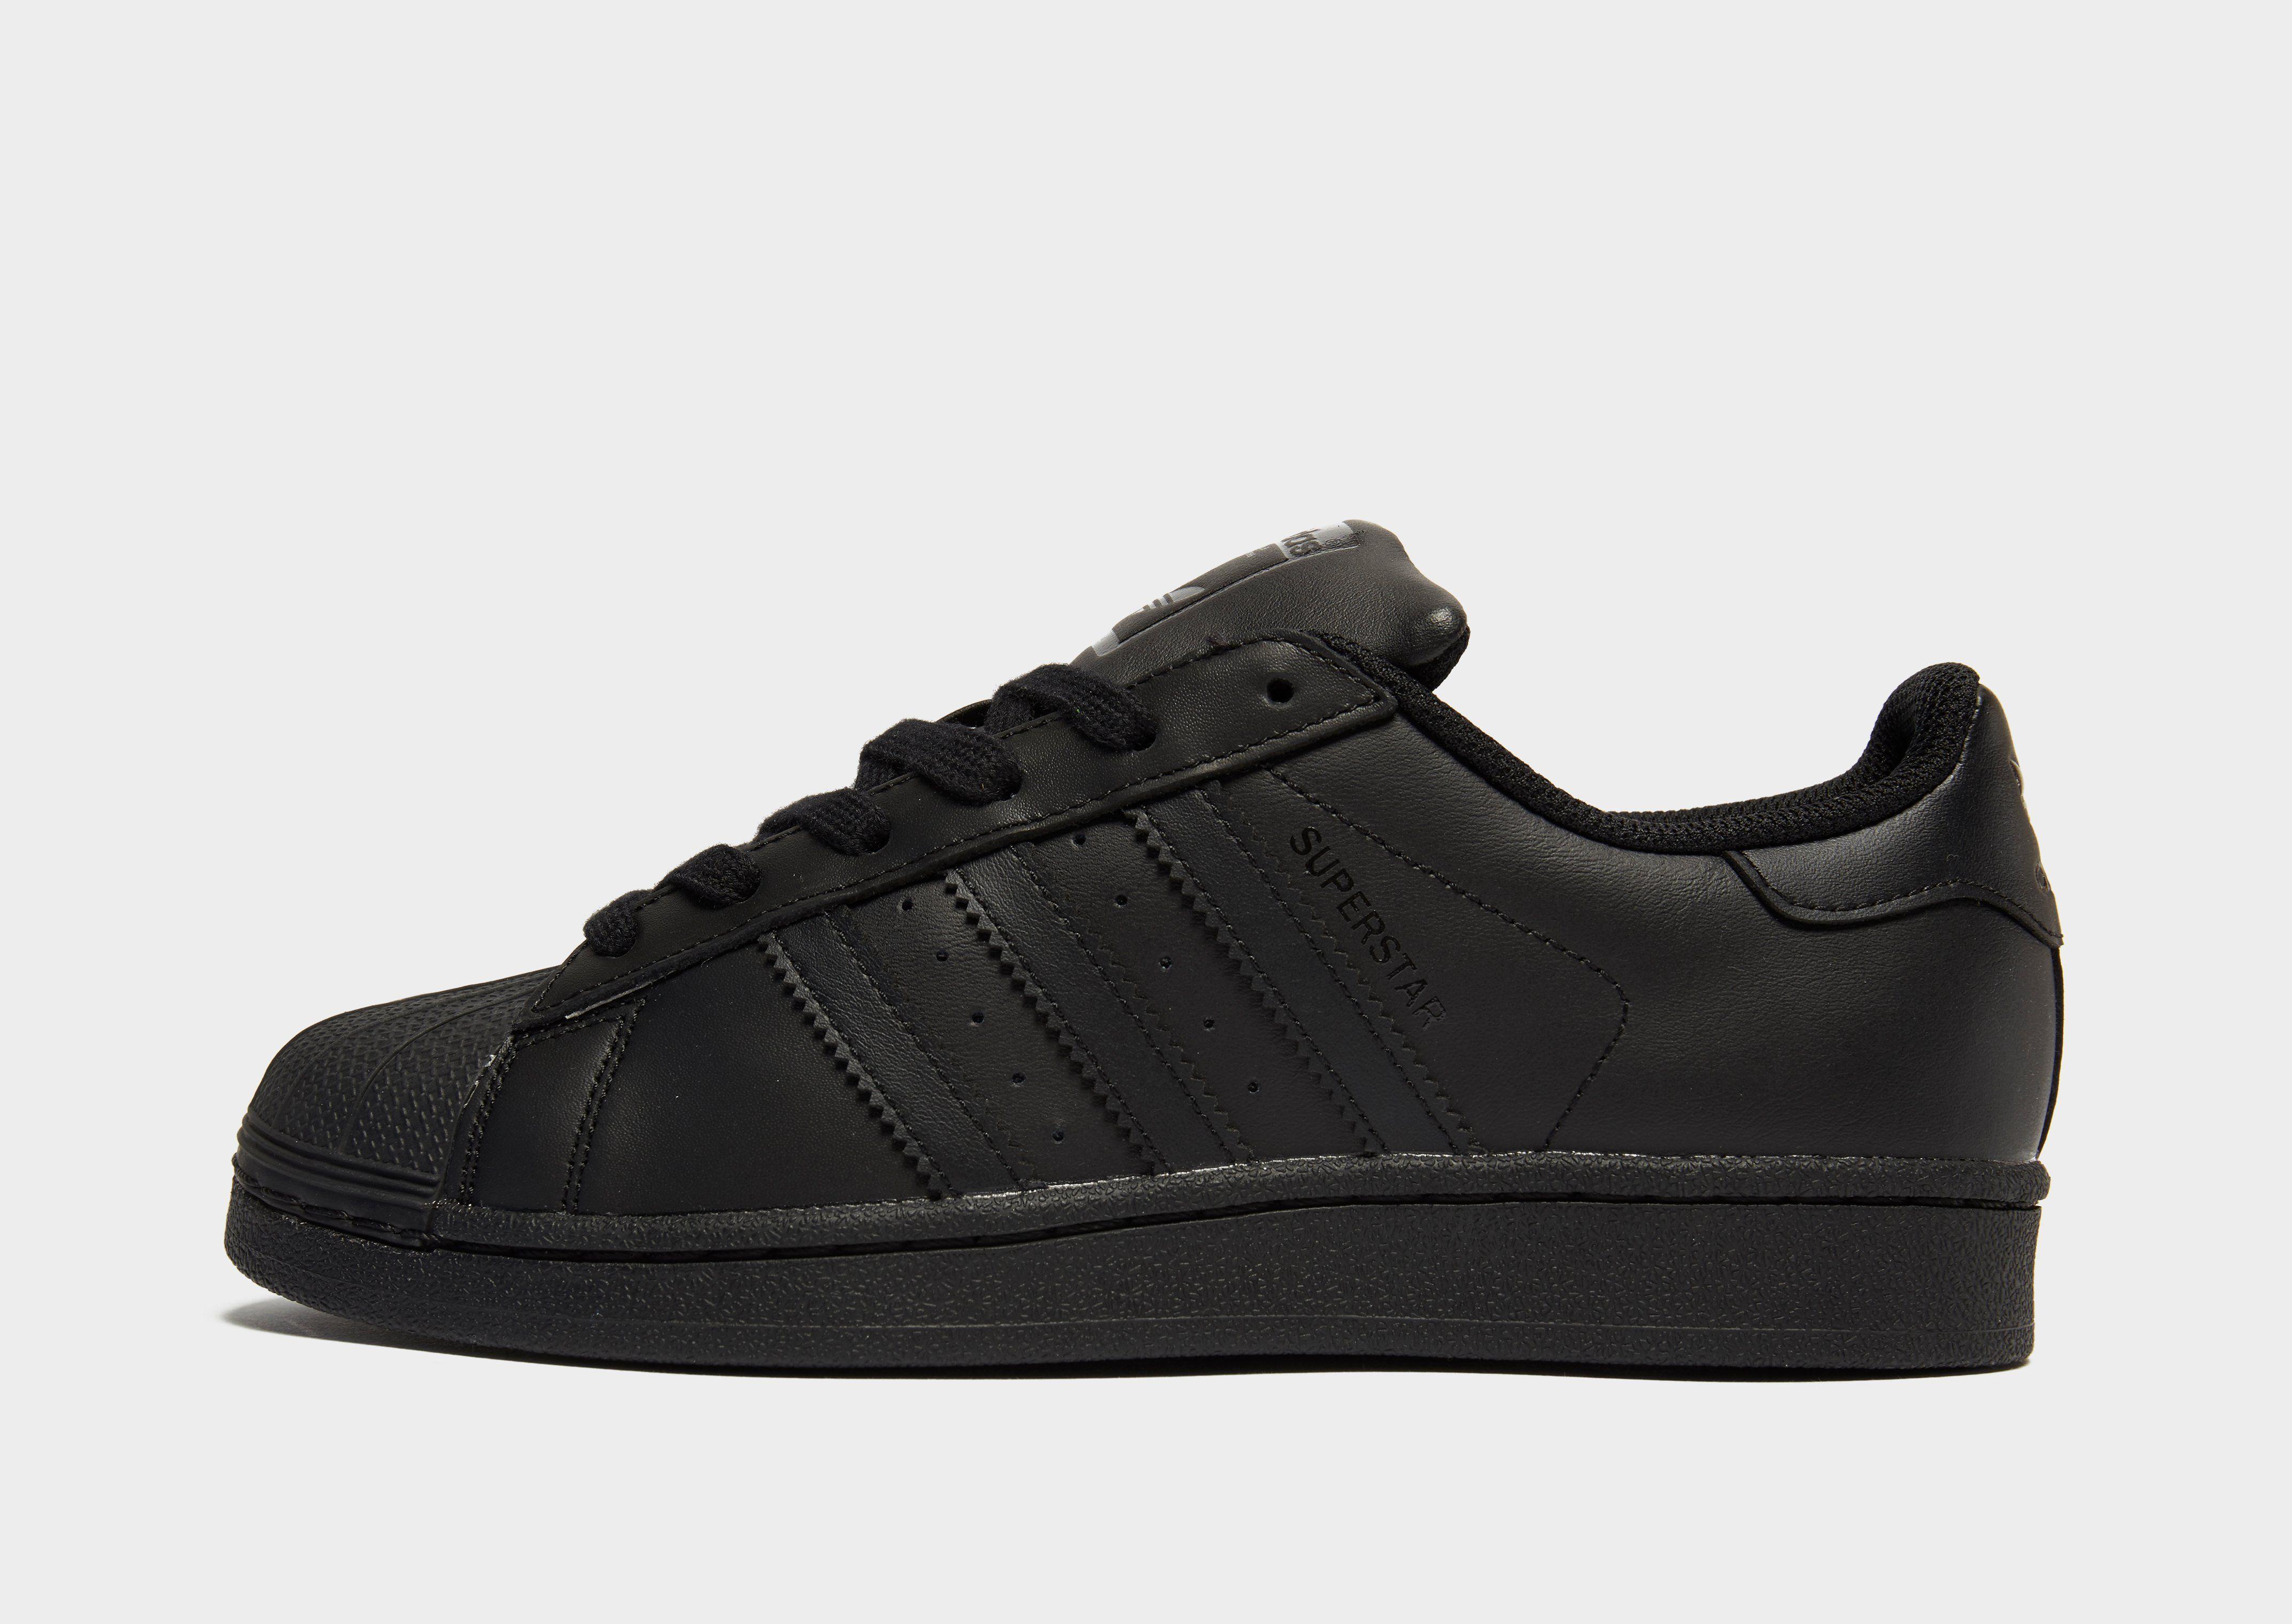 adidas superstar holographic black